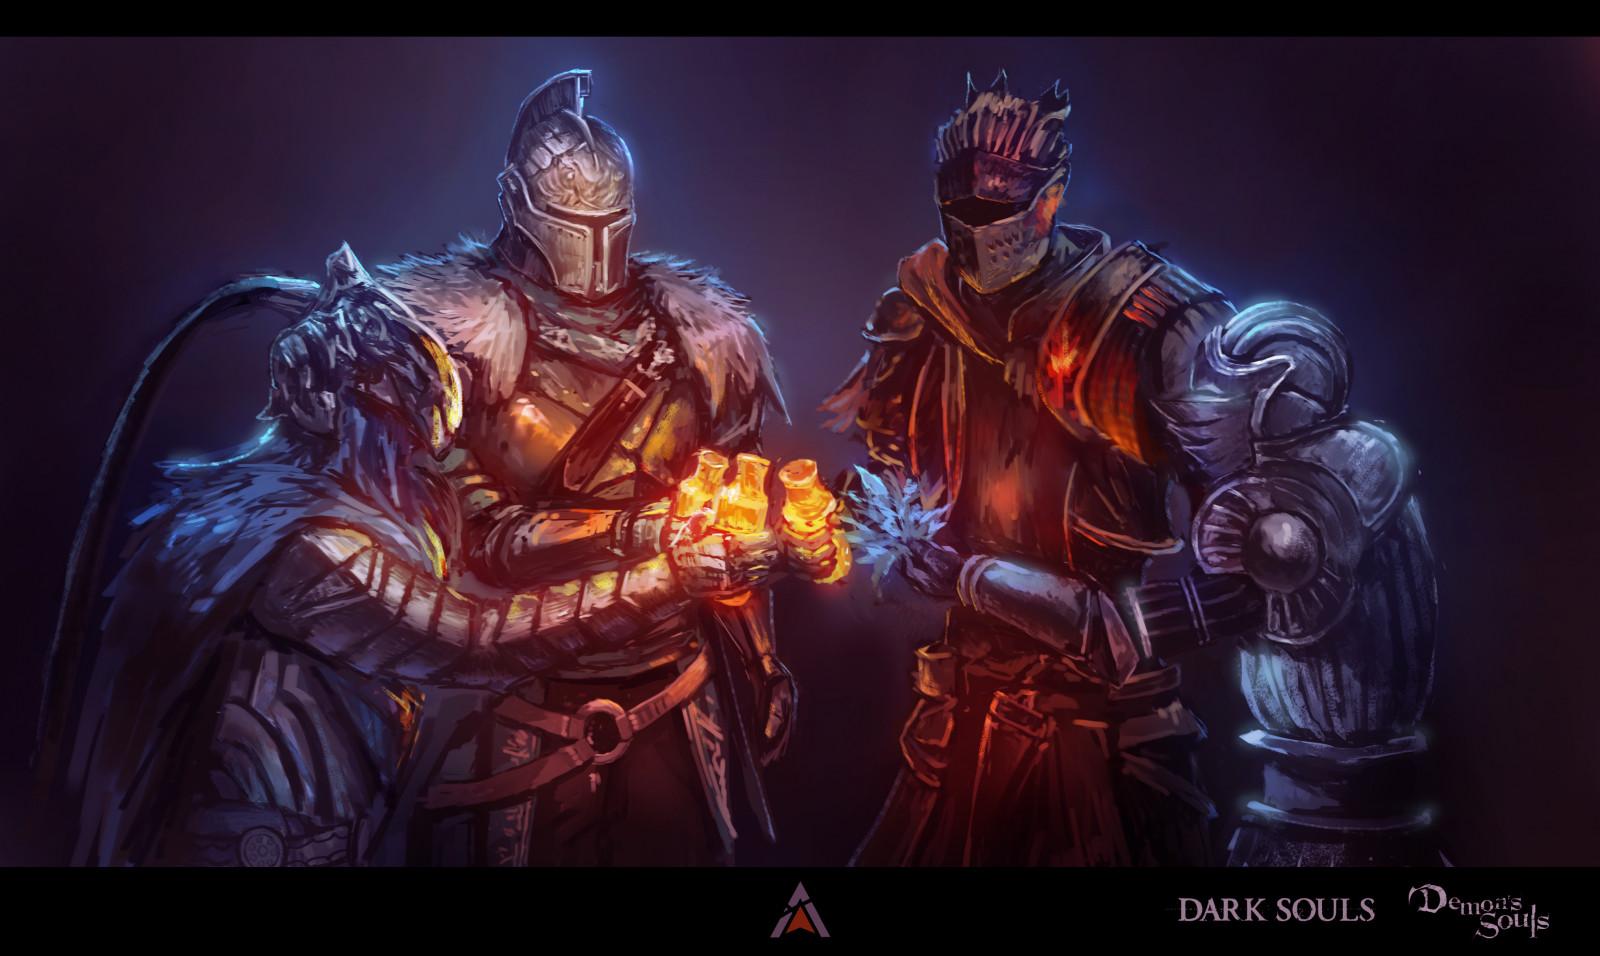 Wallpaper Dark Souls Dark Souls Iii Demon S Souls Dark Souls